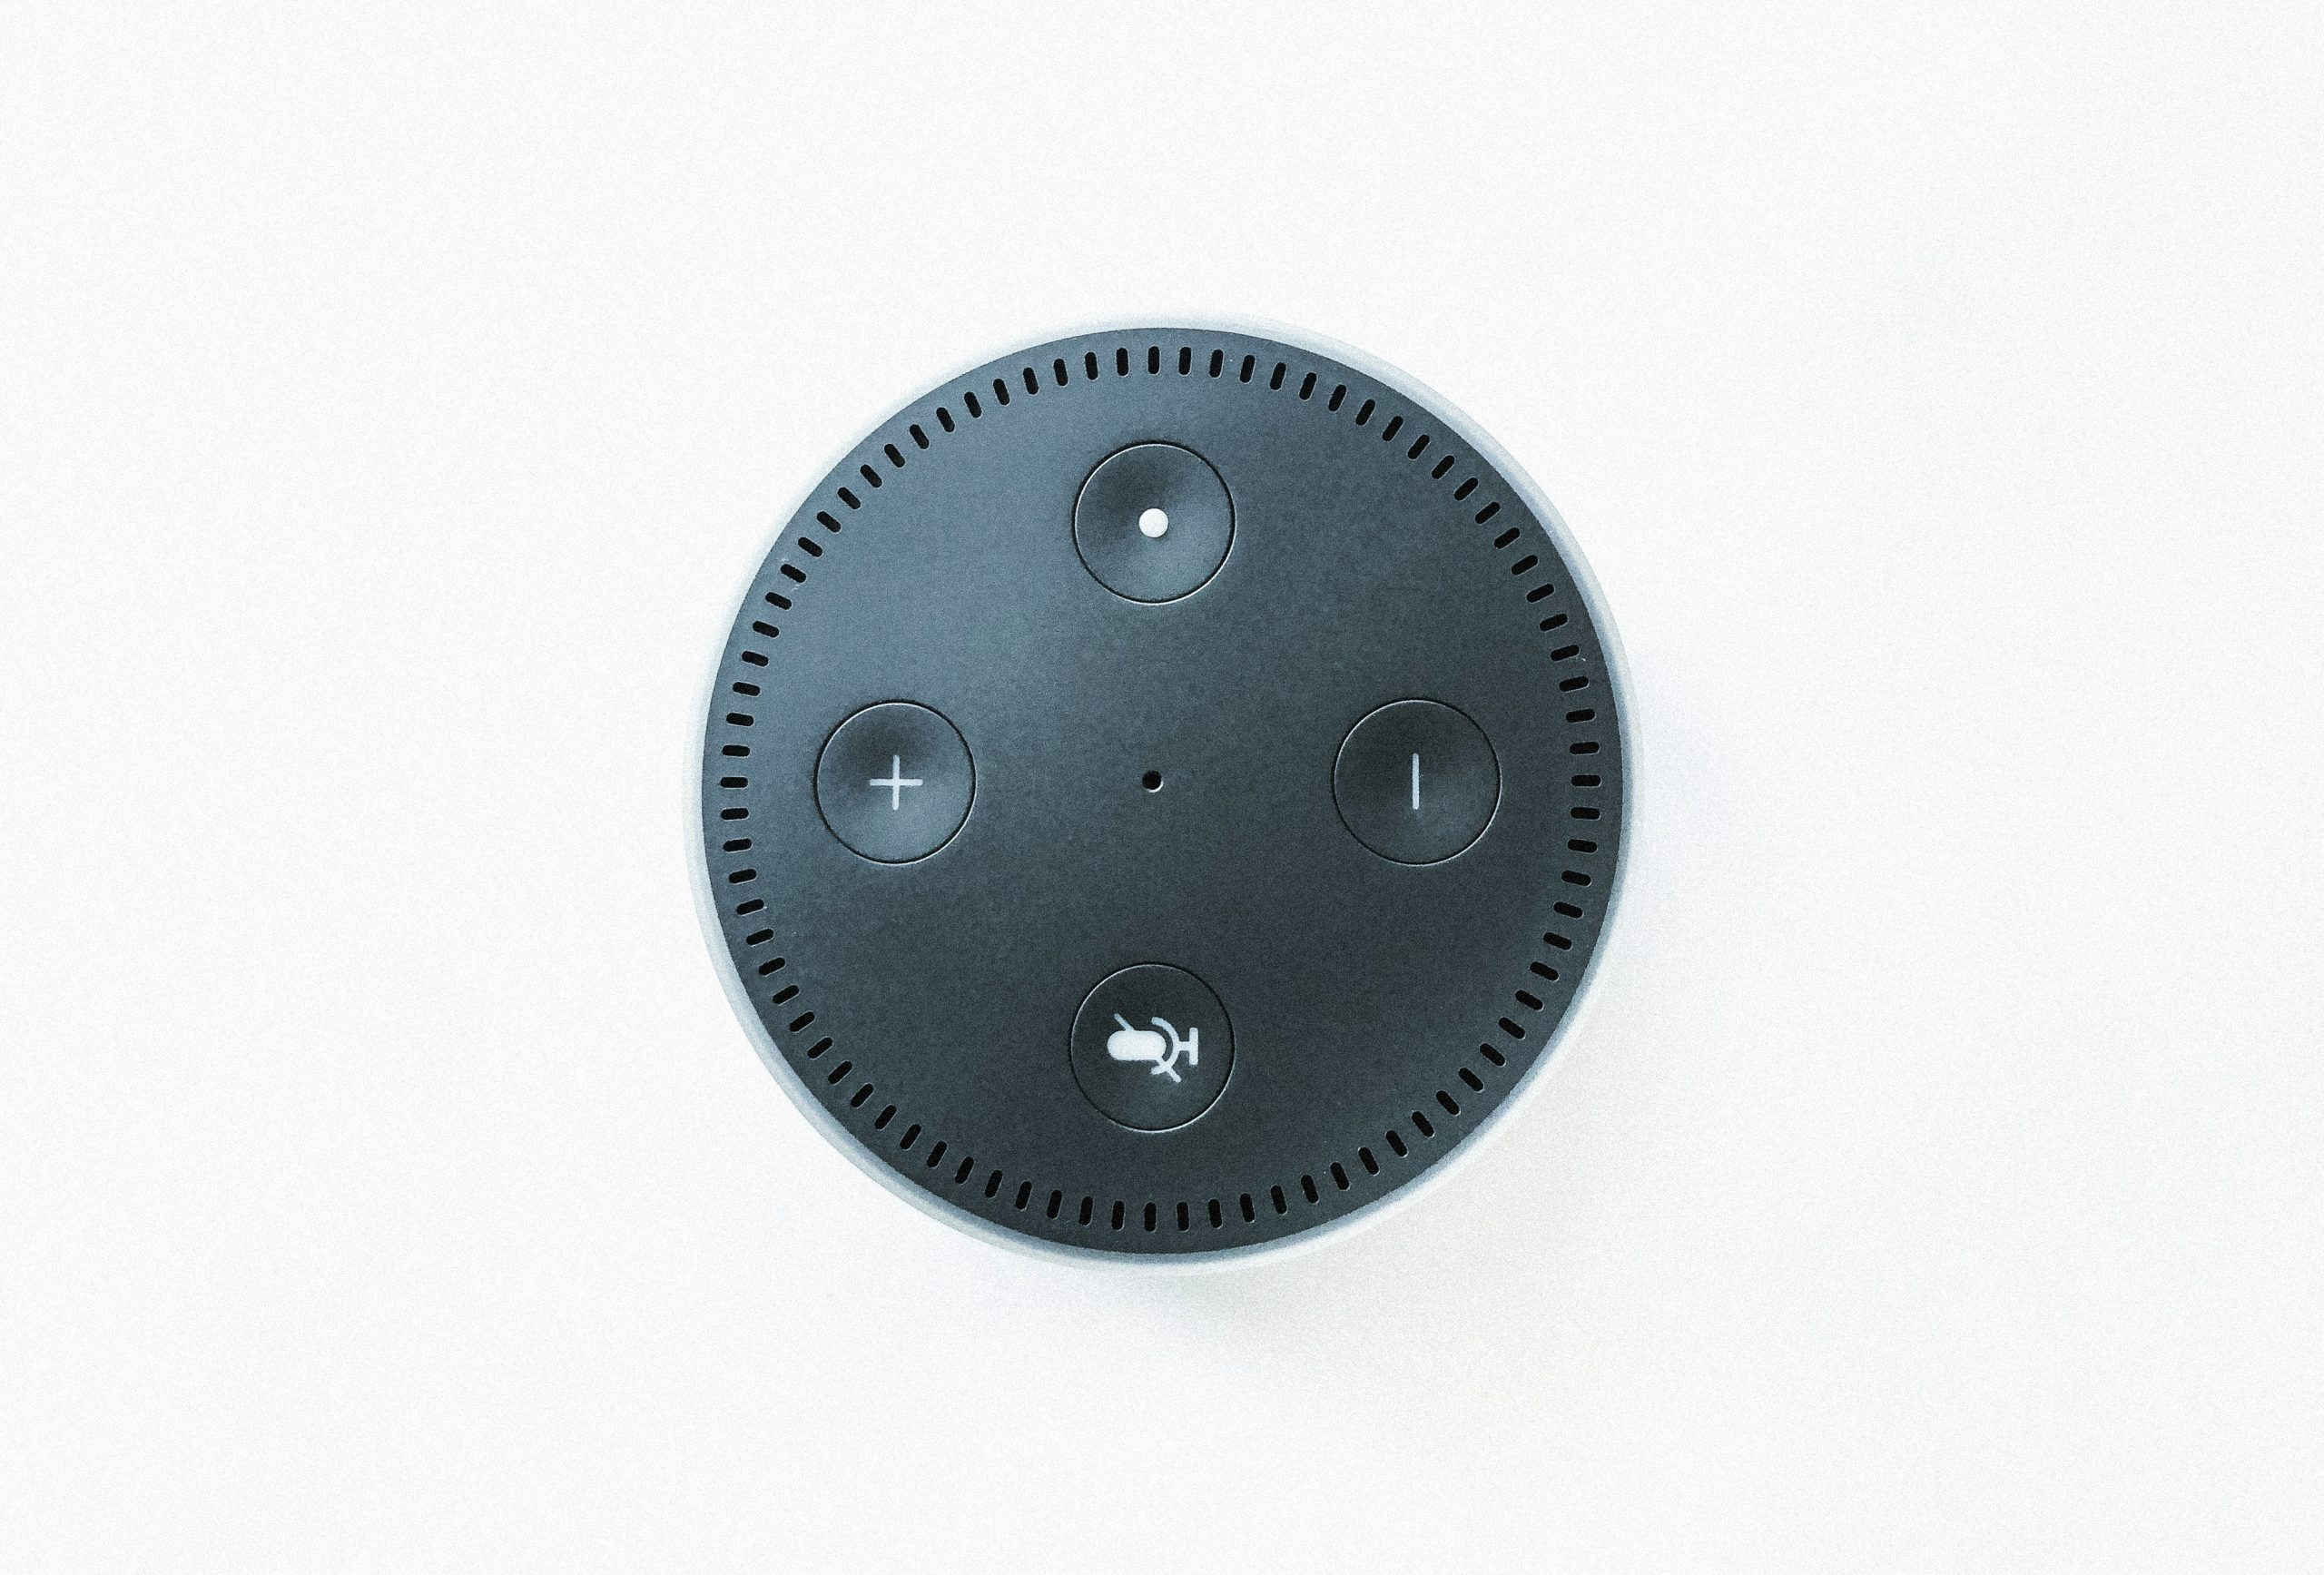 black Amazon echo dot speaker